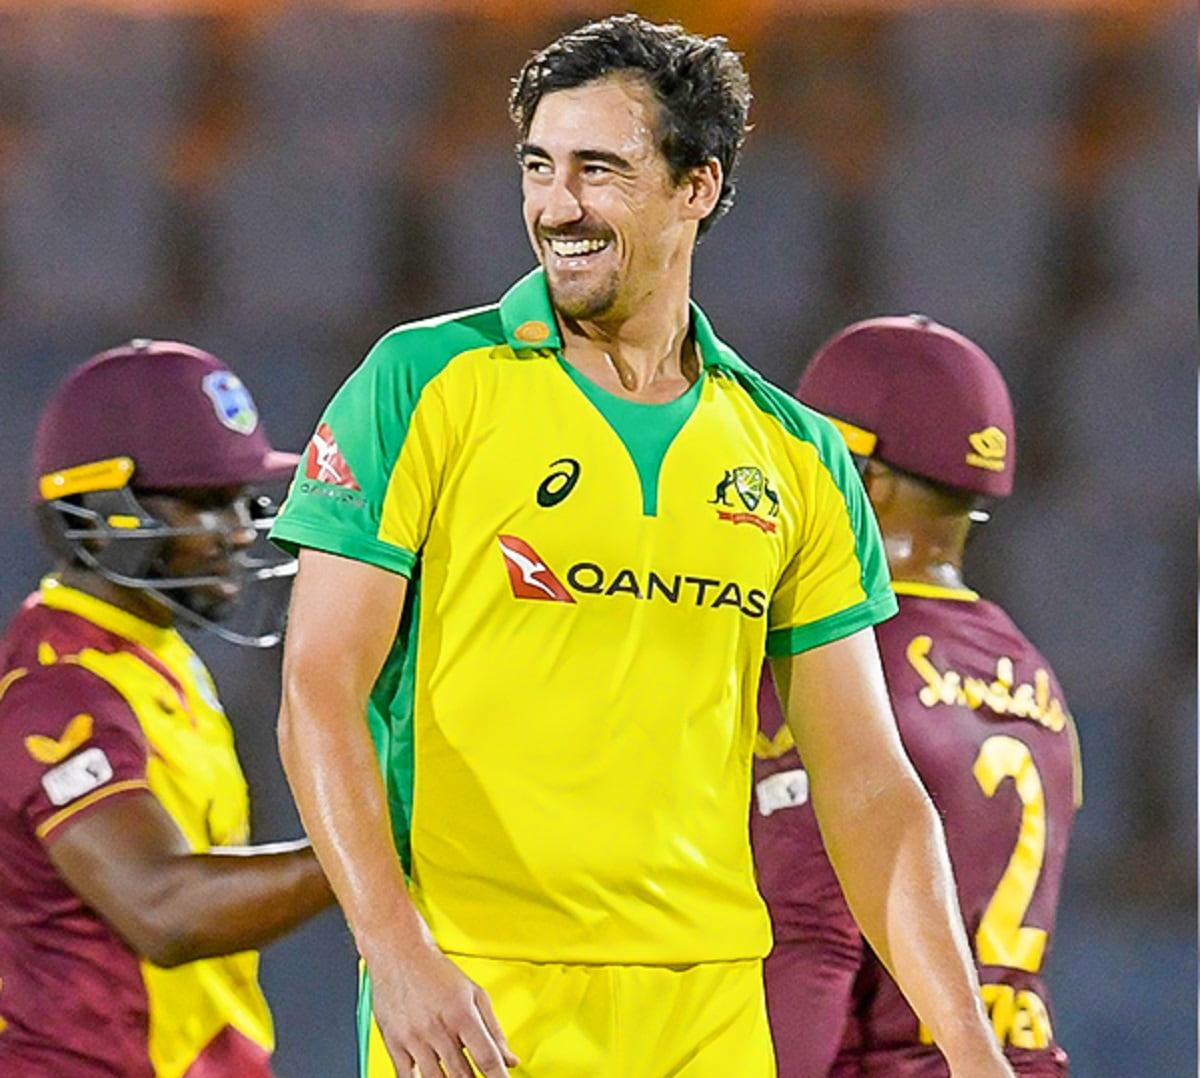 WI vs AUS - Australia beat west Indies by 133 runs